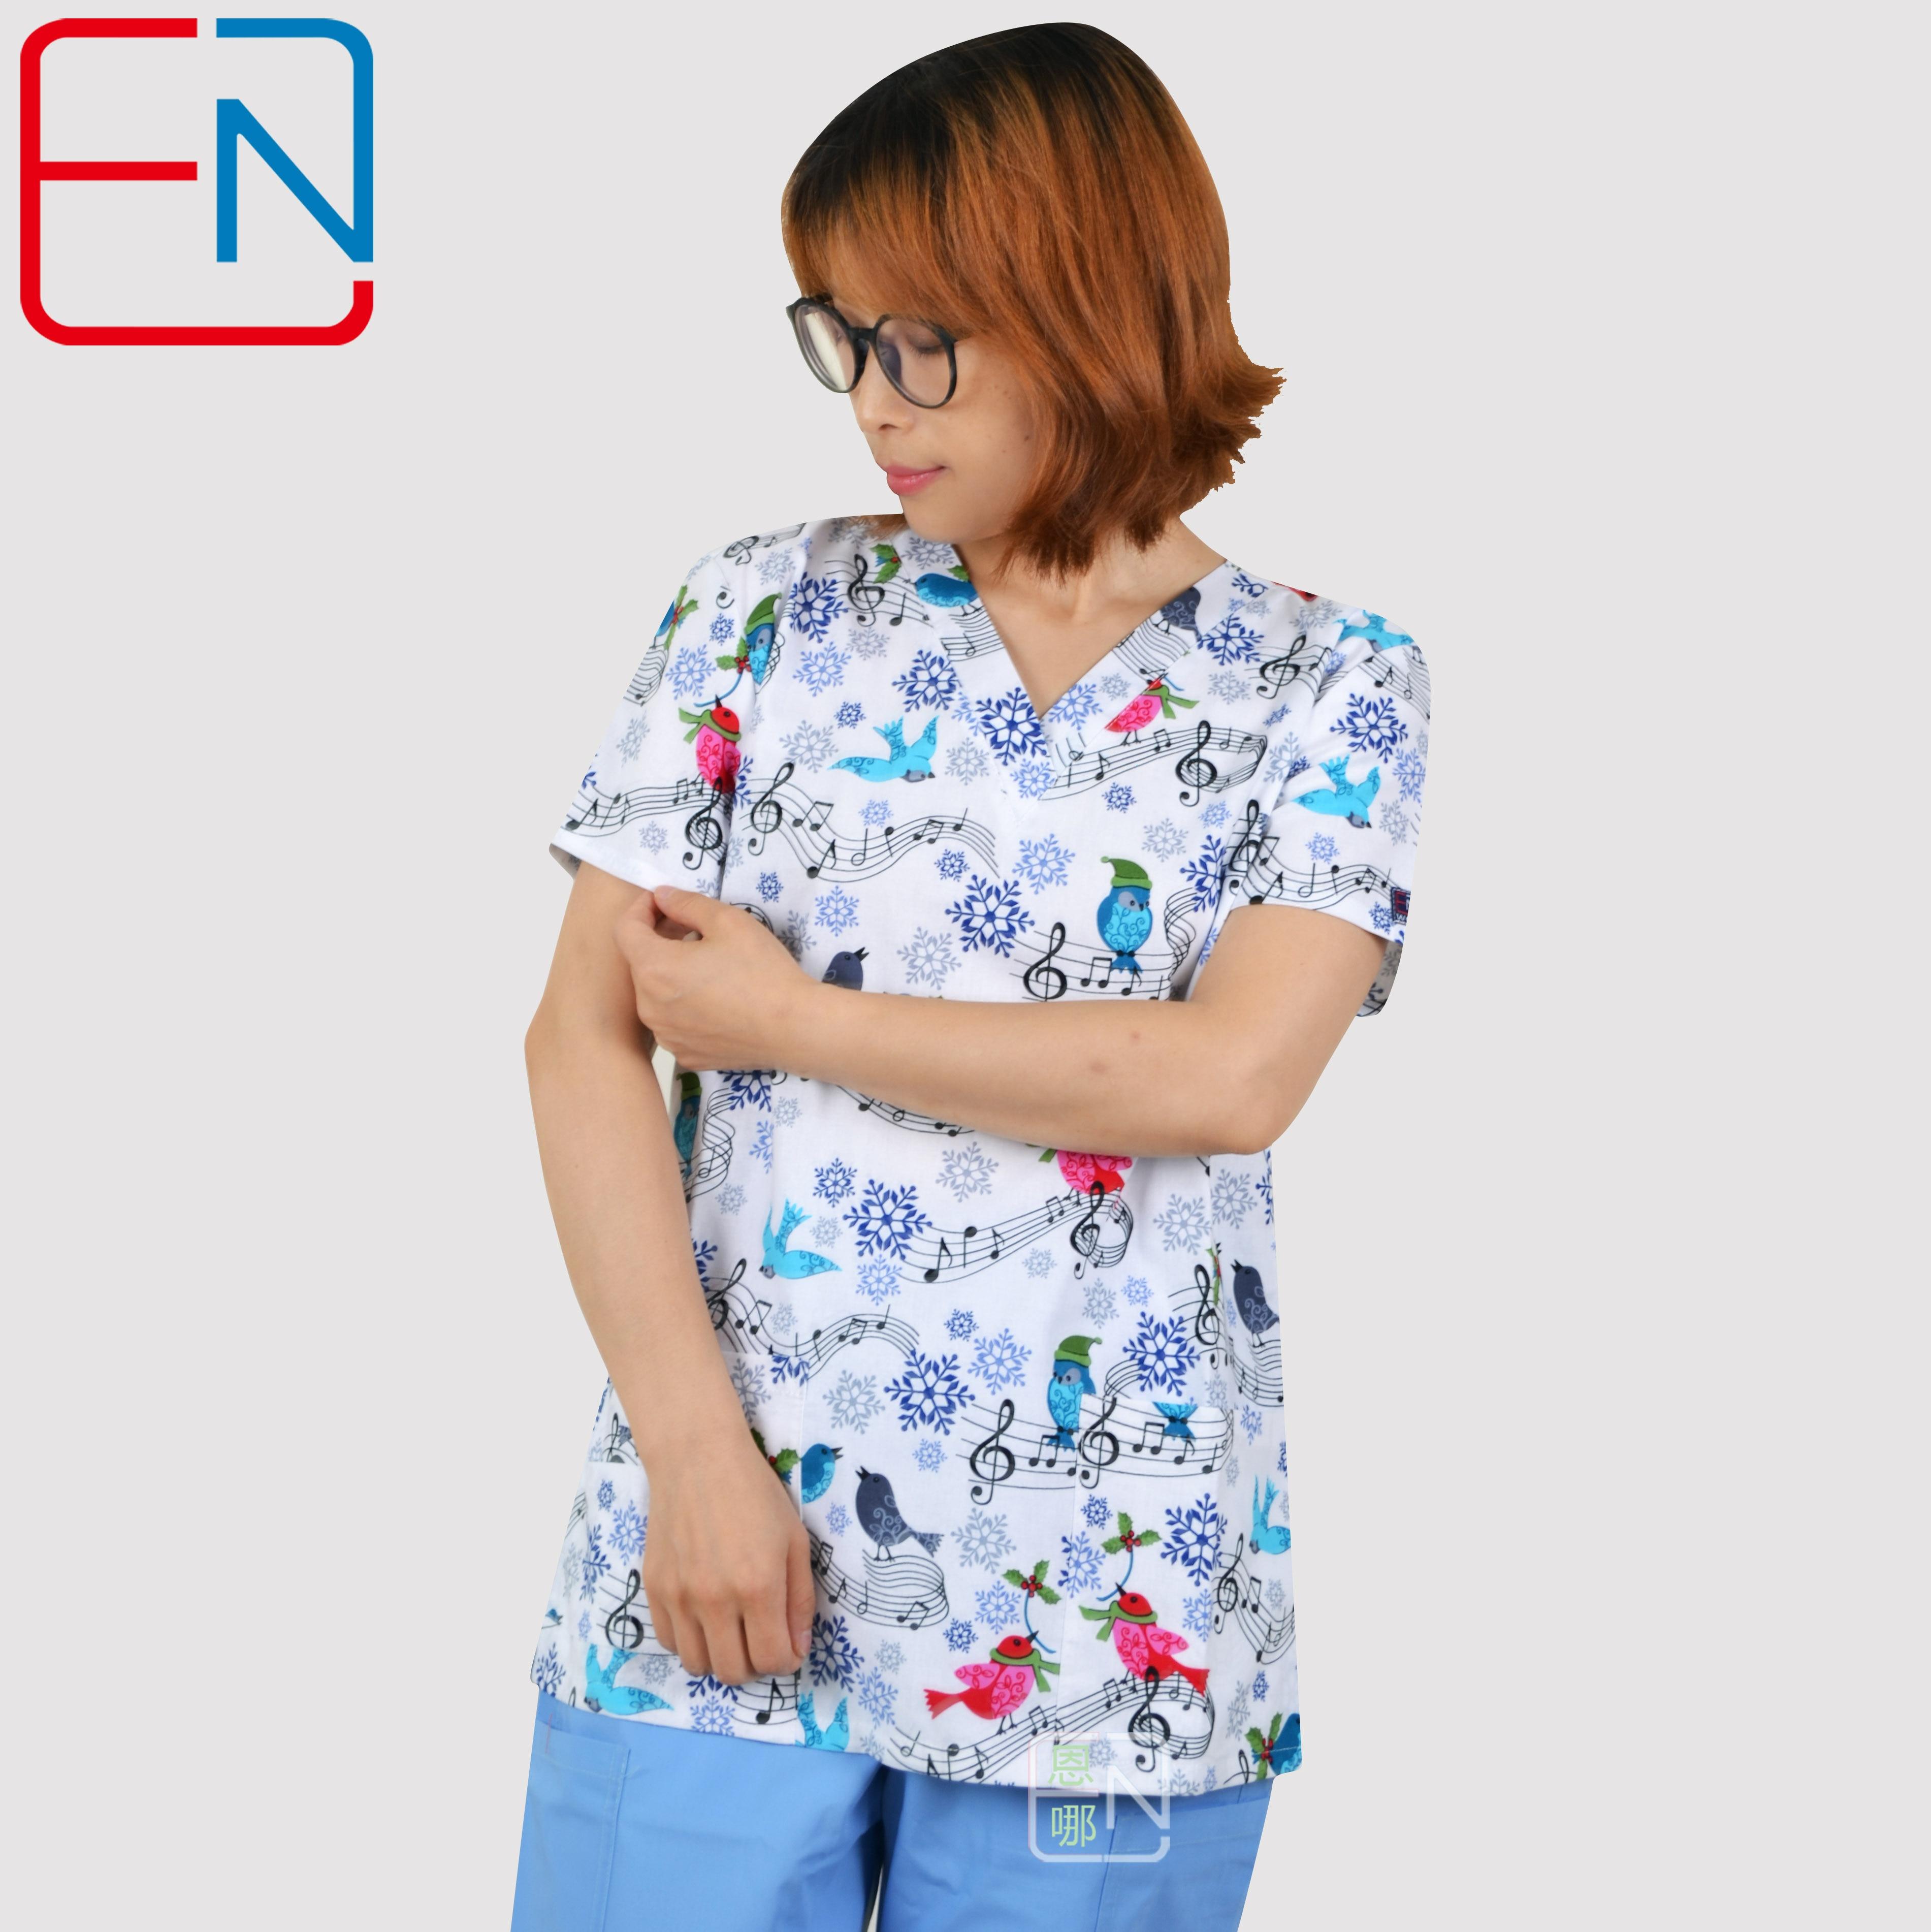 Hennar Women Medical Scrub Tops V Neck White Print Notes 100% Cotton Surgical Scrubs Top Hospital Clinical Medical Uniformswomen medical scrubsmedical scrubsmedical scrub top -